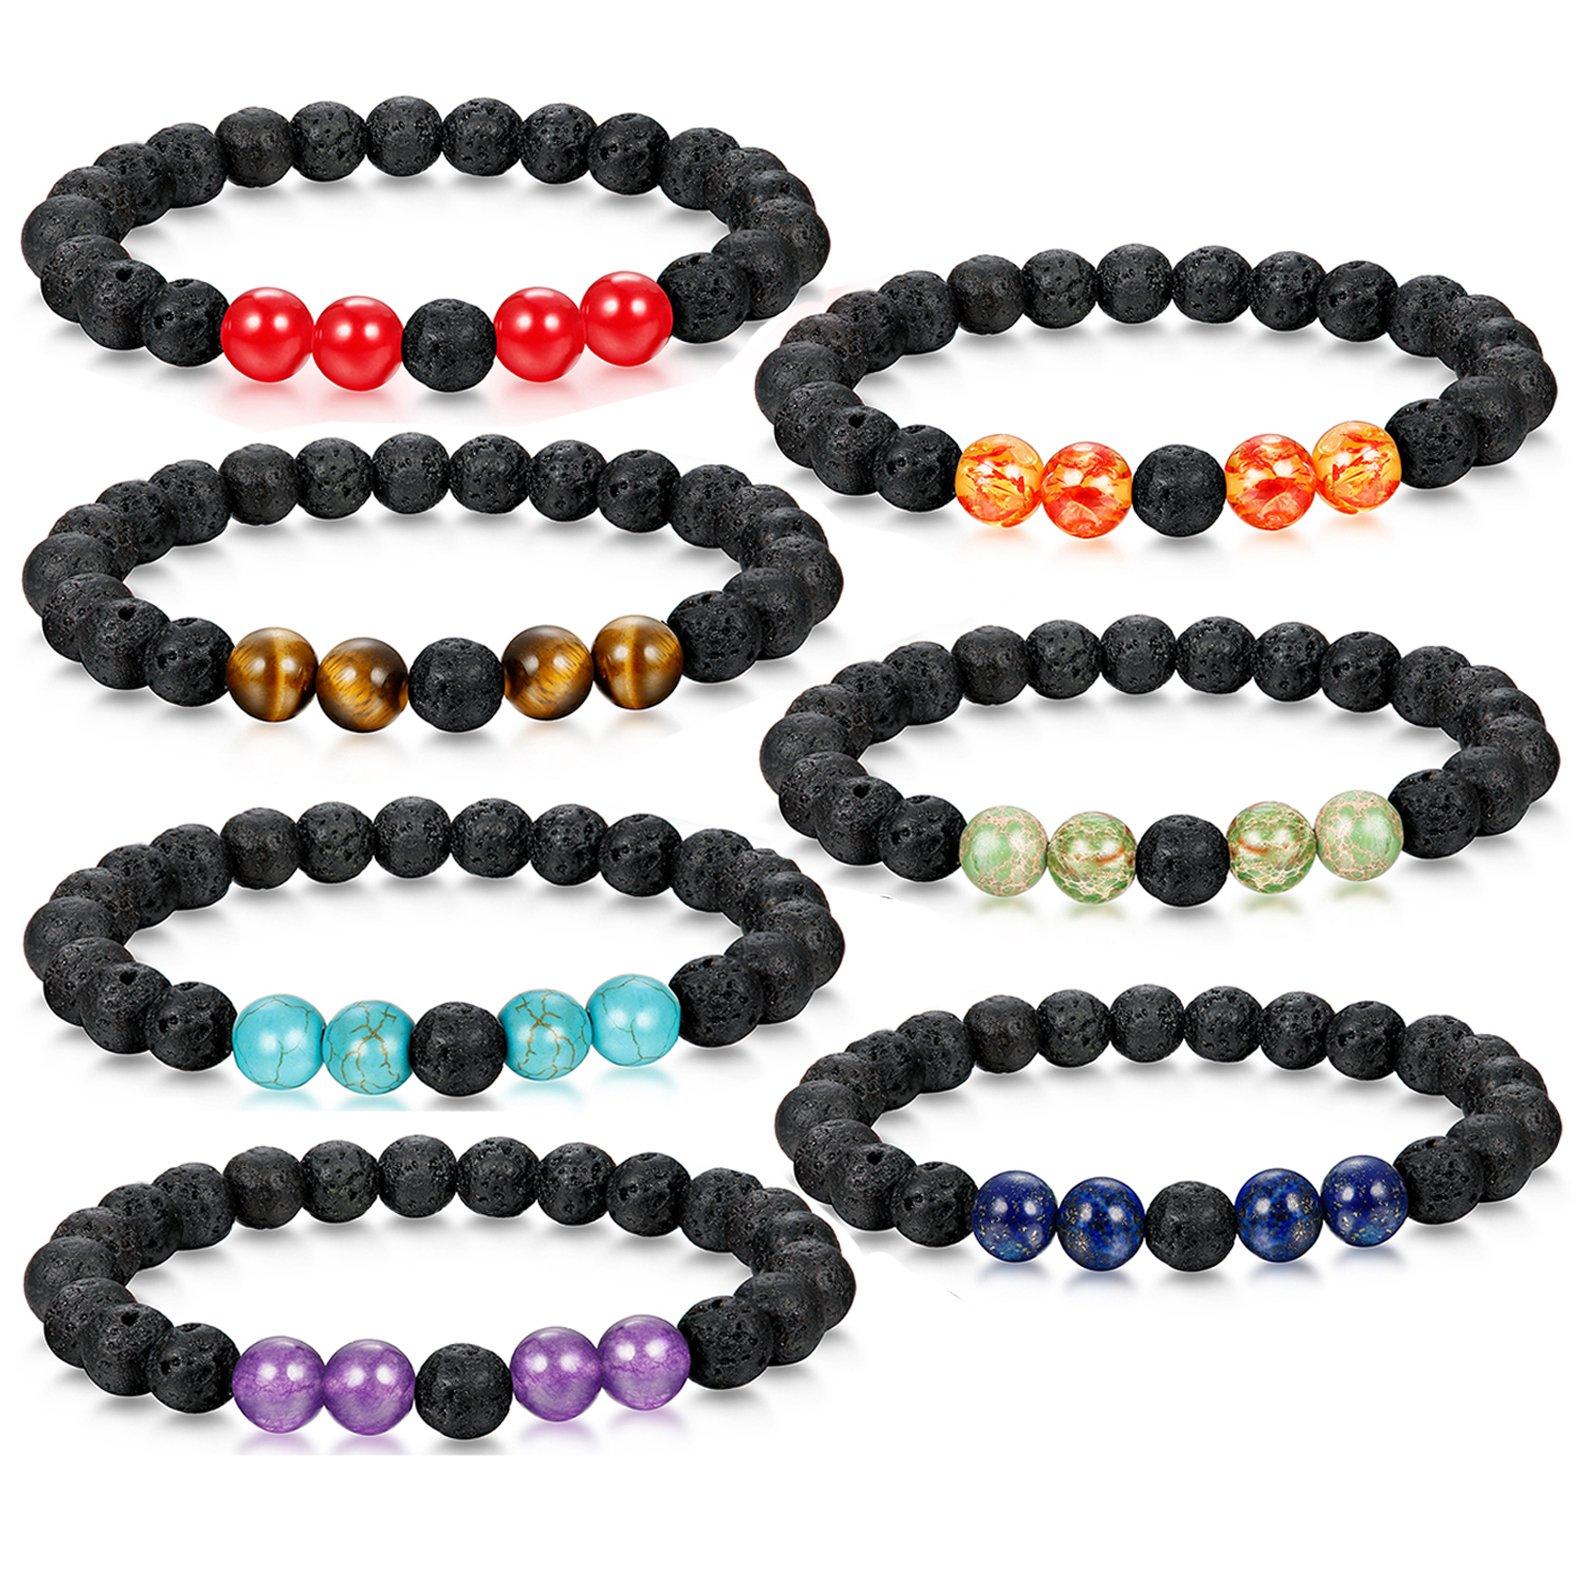 Adramata Aromatherapy Chakra Bracelets for Men Women Oil Diffuser Anxiety Bracelet Set